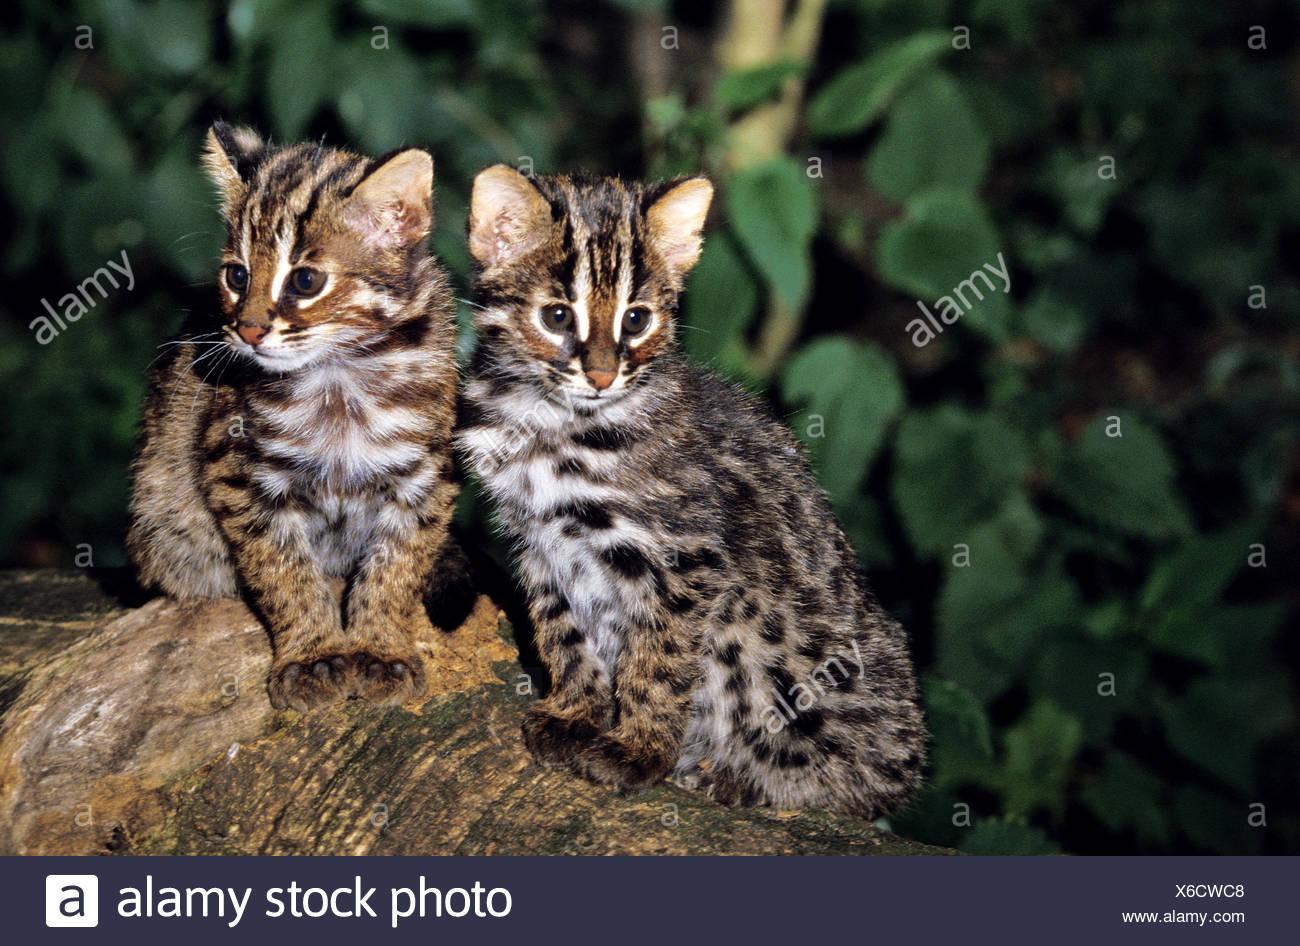 cost of siberian cat